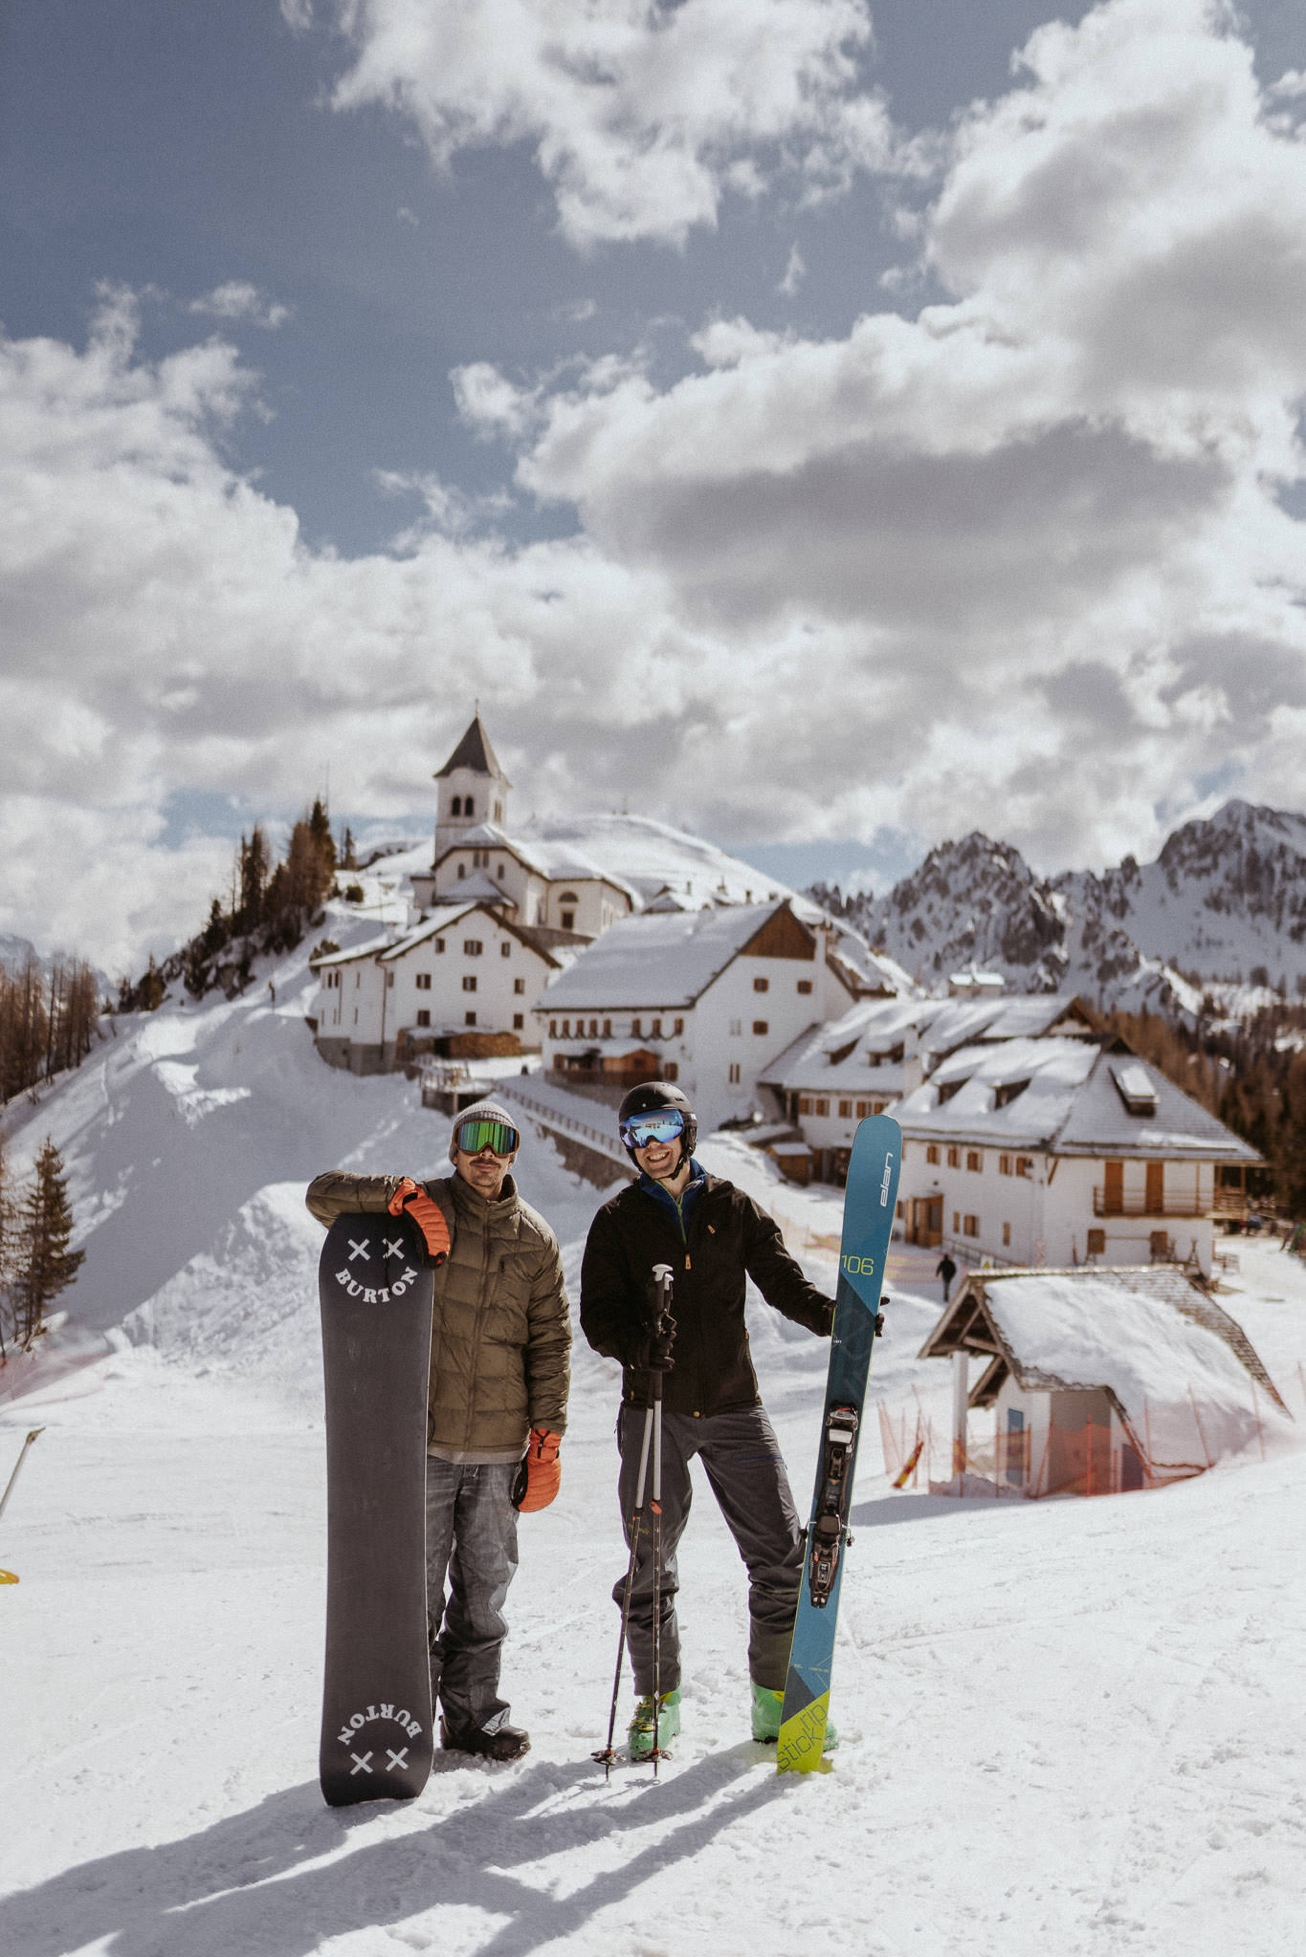 30 Višarje snowboard izlet smučanje Svete Monte Lussari